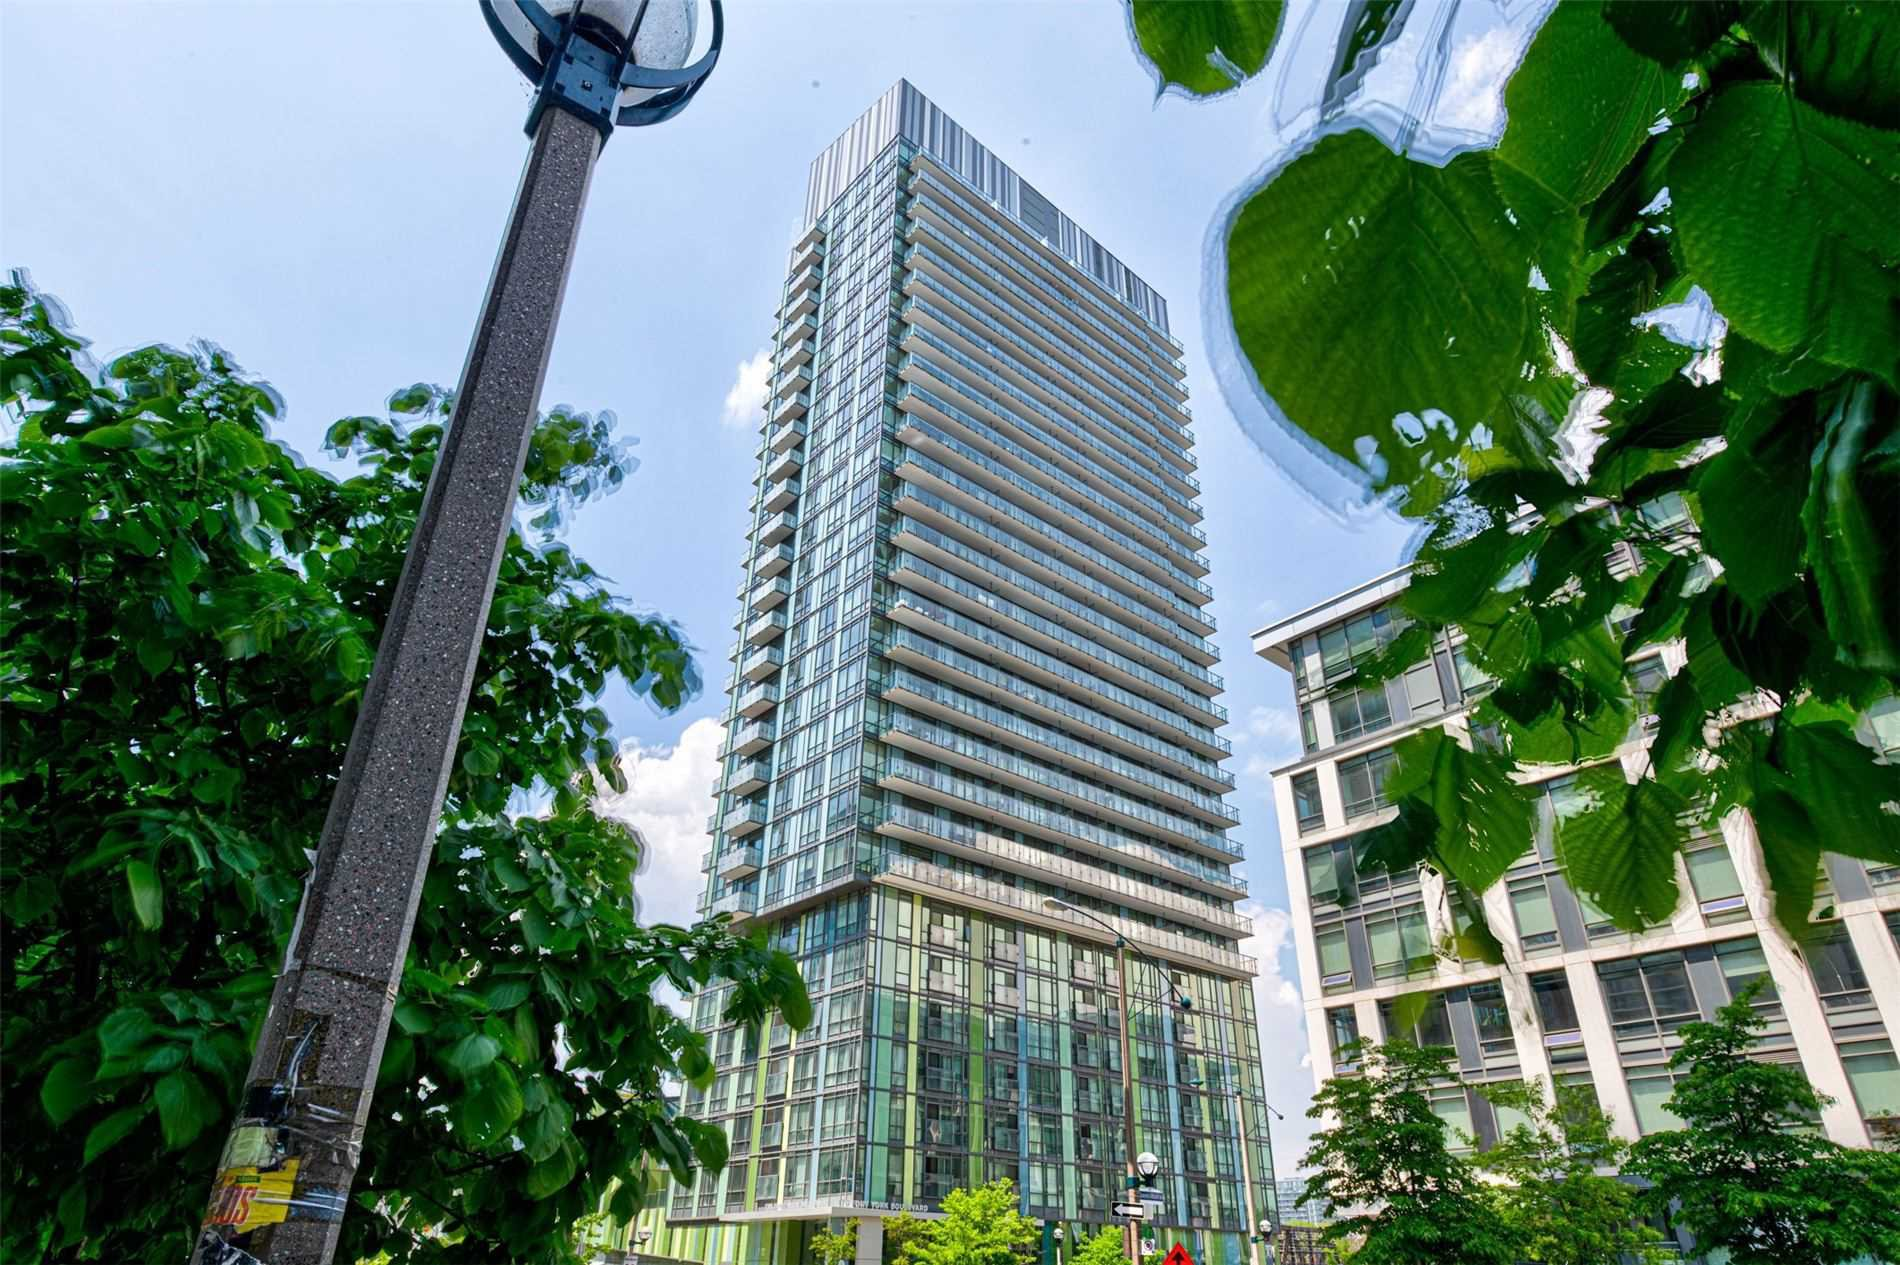 Main Photo: 1302 170 Fort York Boulevard in Toronto: Waterfront Communities C1 Condo for lease (Toronto C01)  : MLS®# C4784665